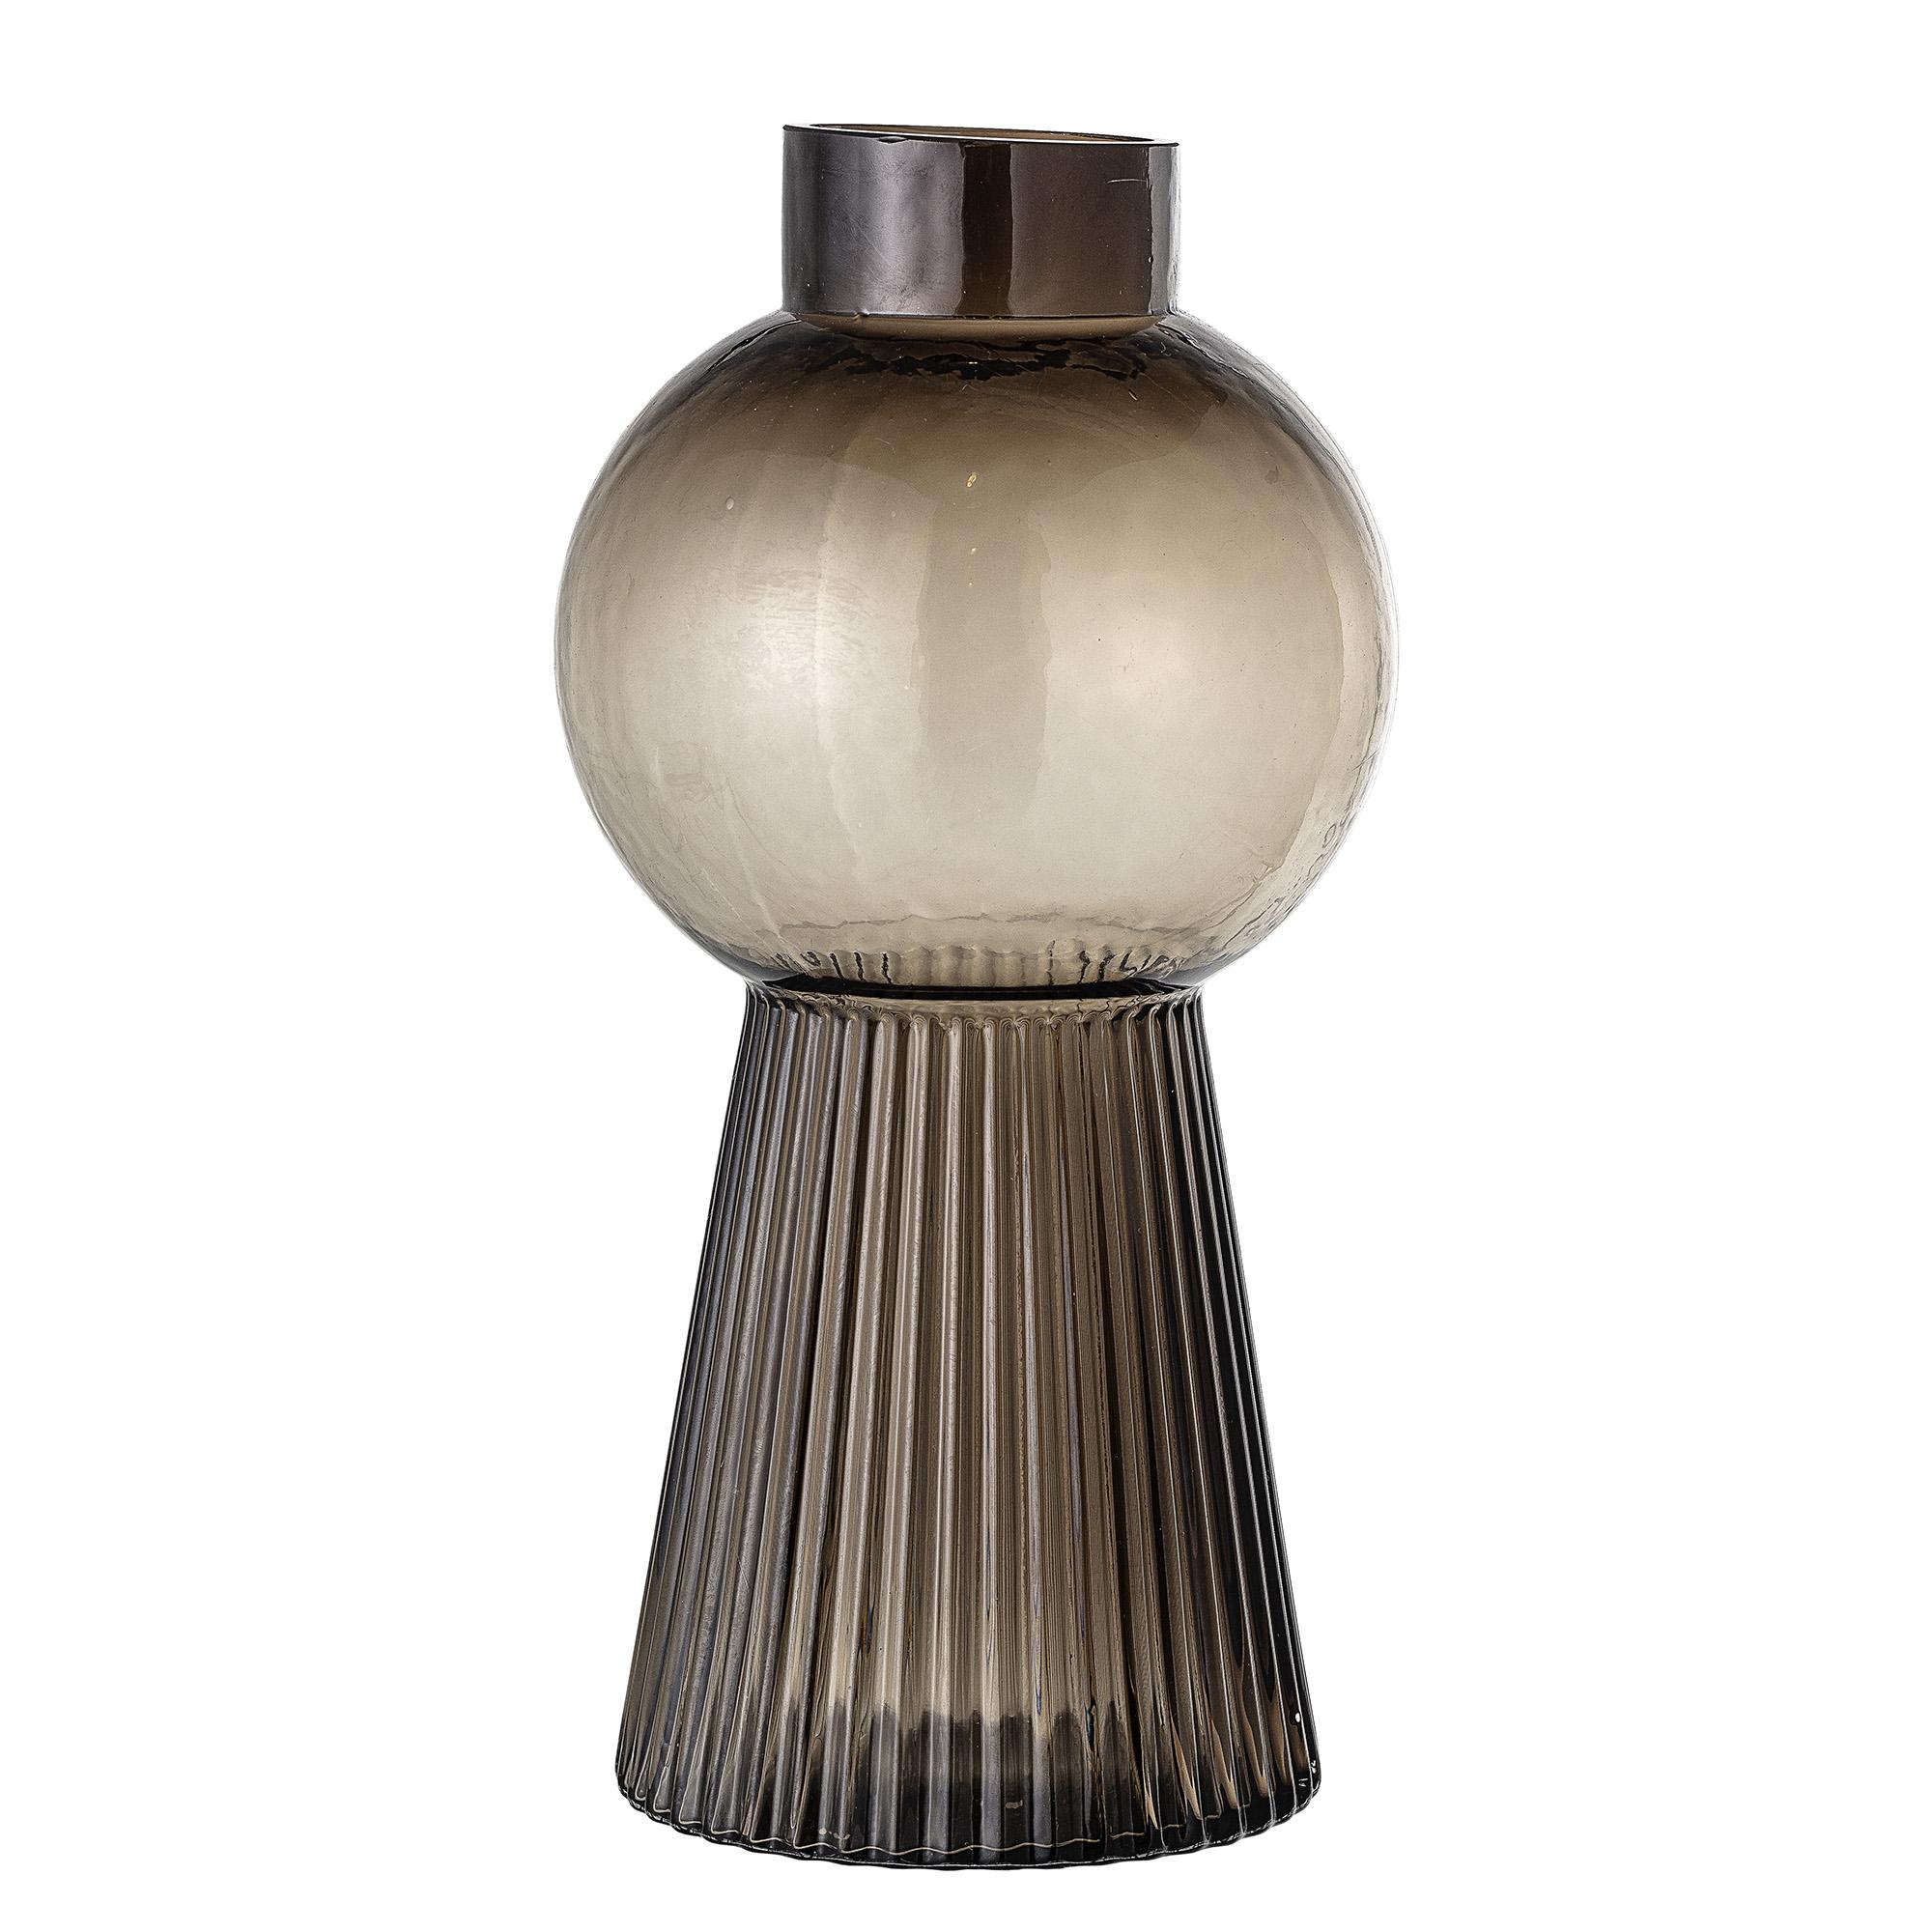 Bloomingville Nabaha vase